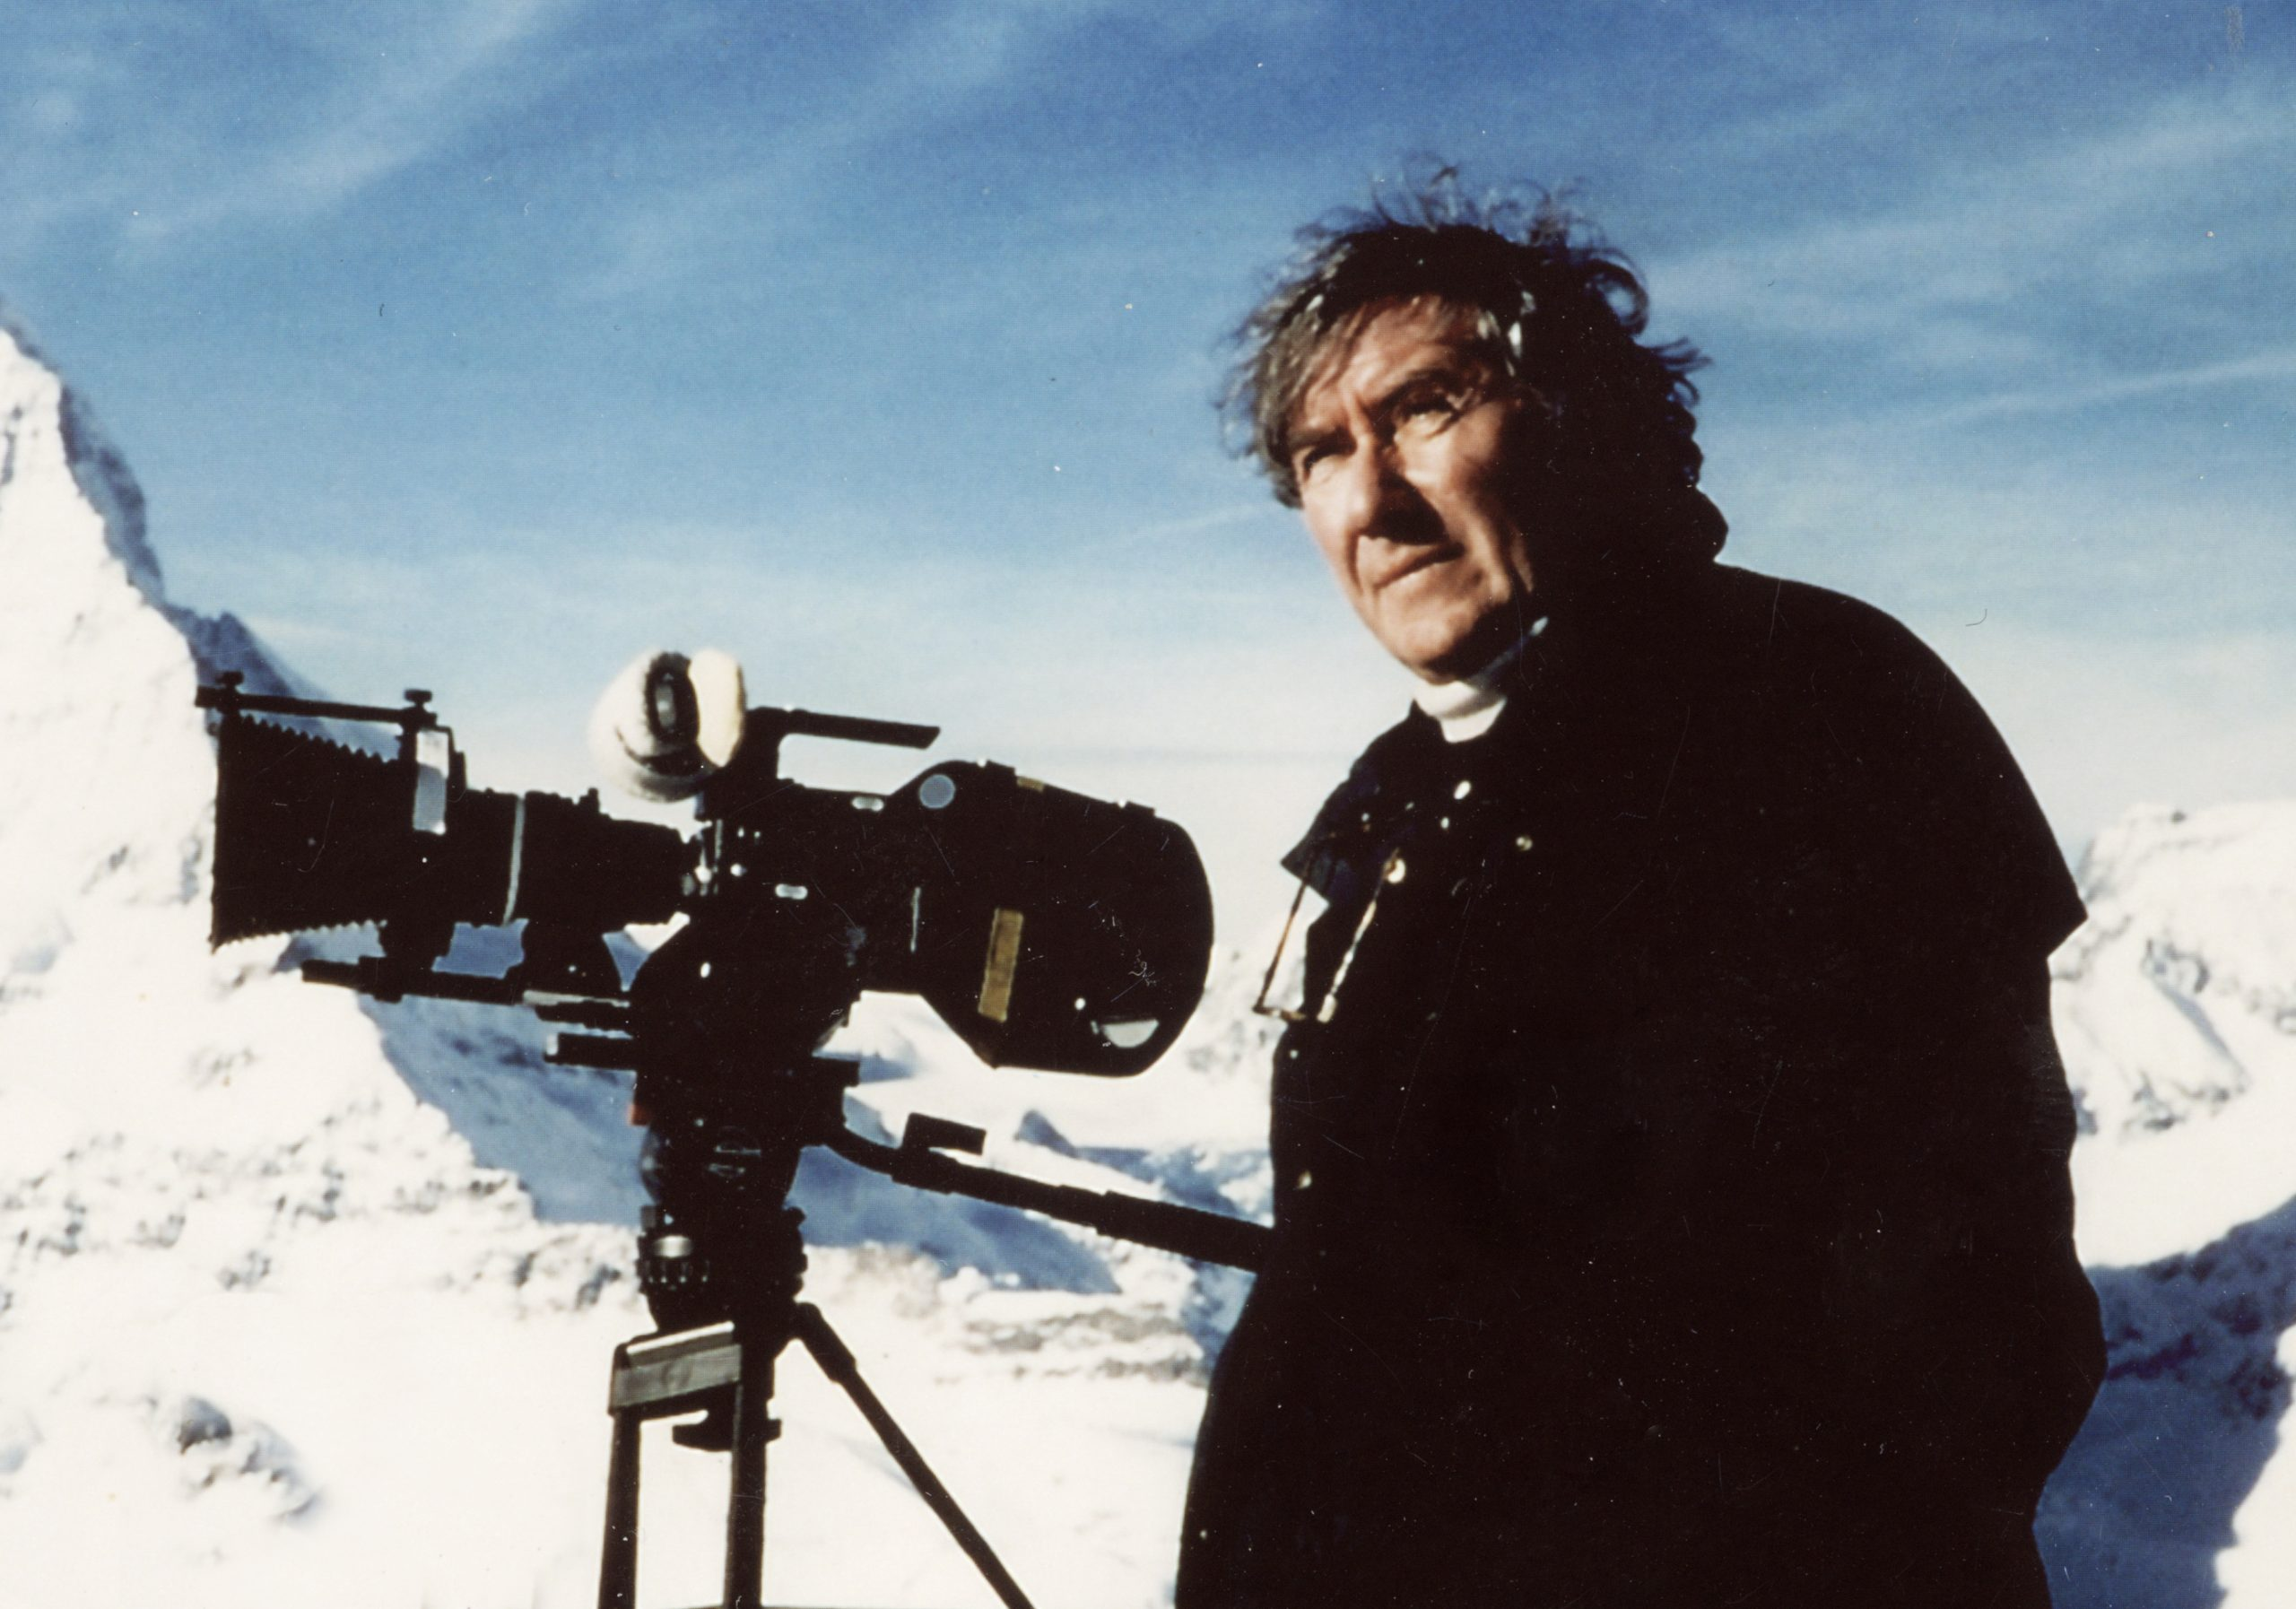 Martin Bosboom